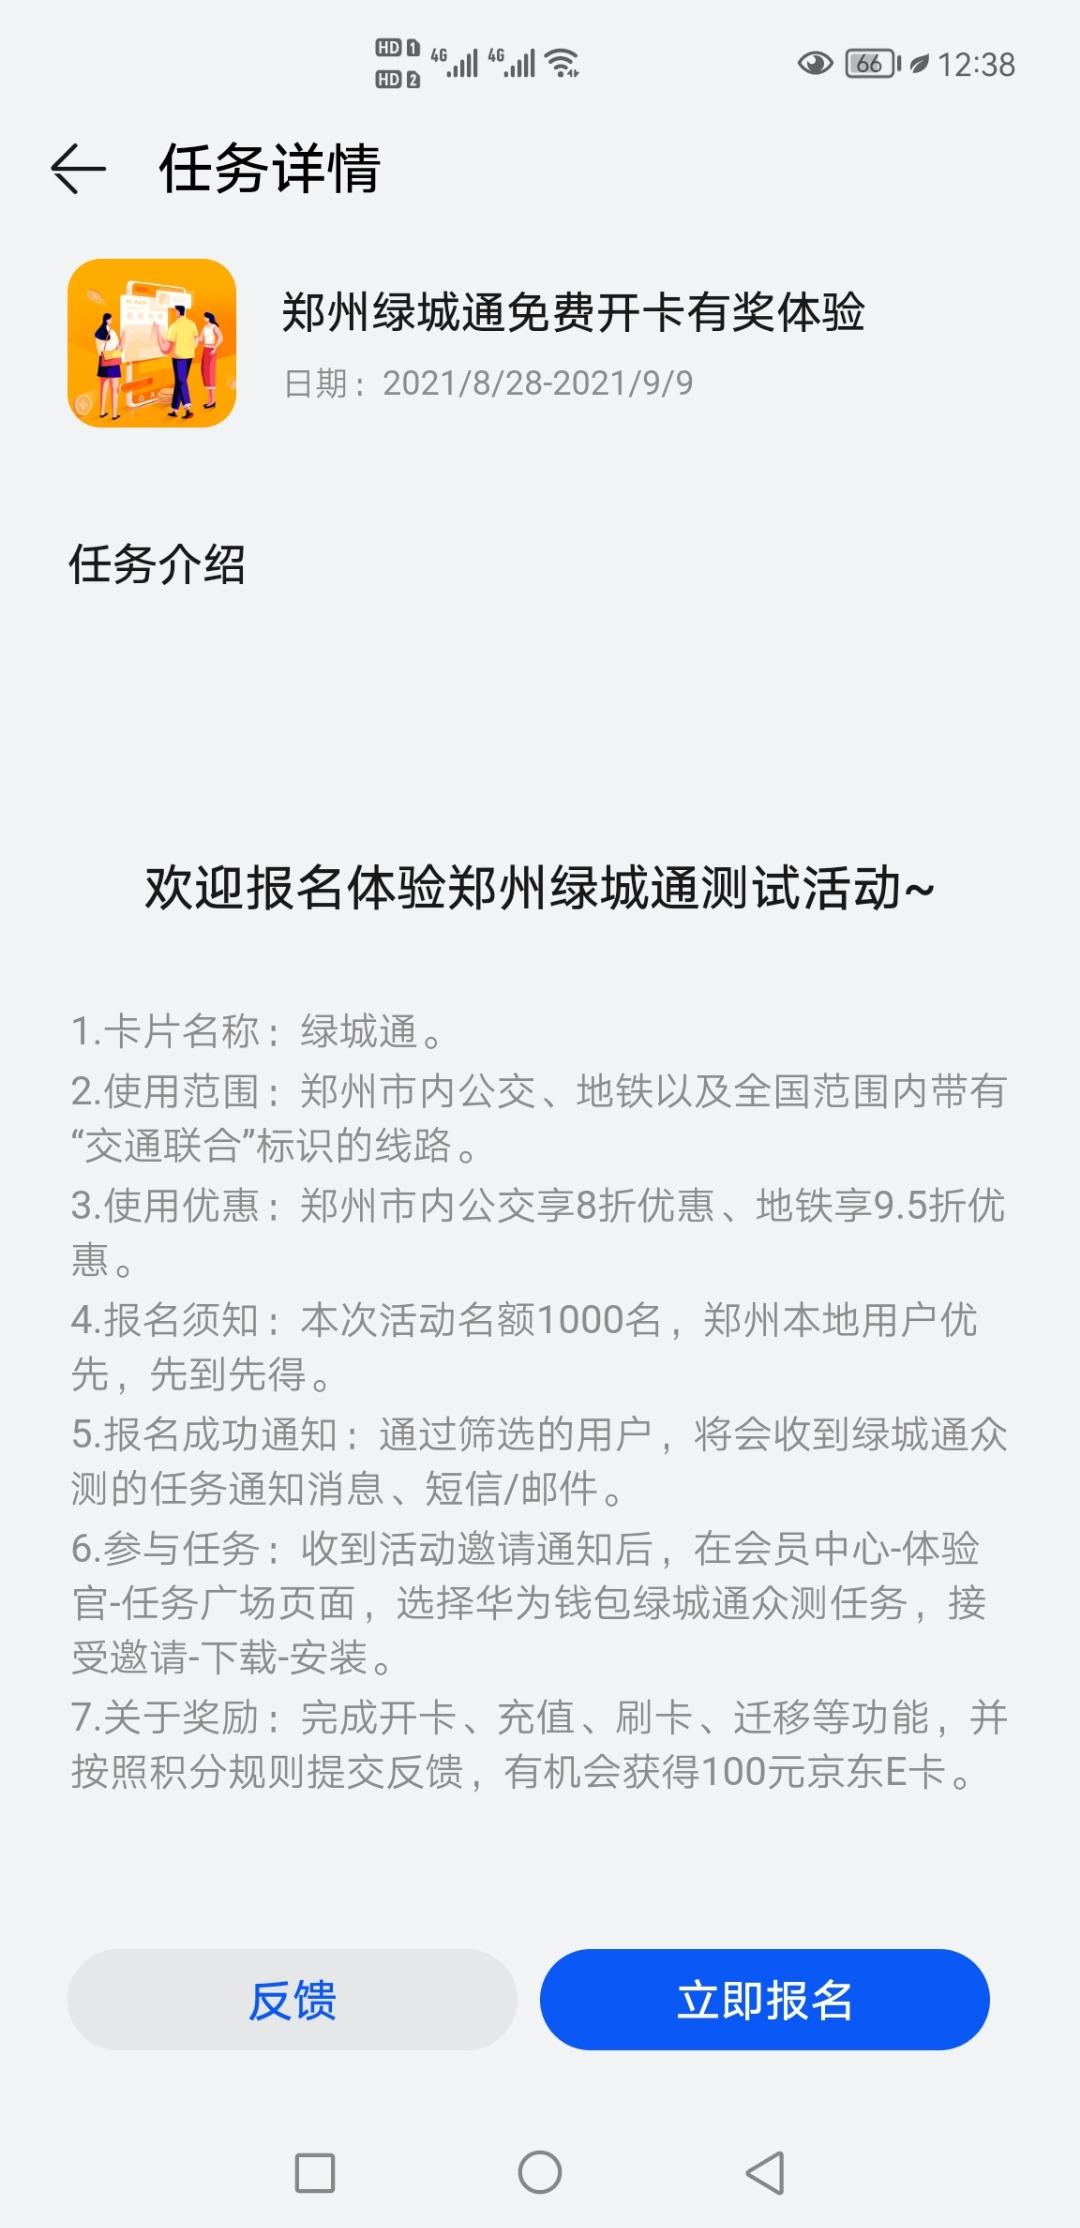 Screenshot_20210828_003854_com.huawei.mycenter.jpg